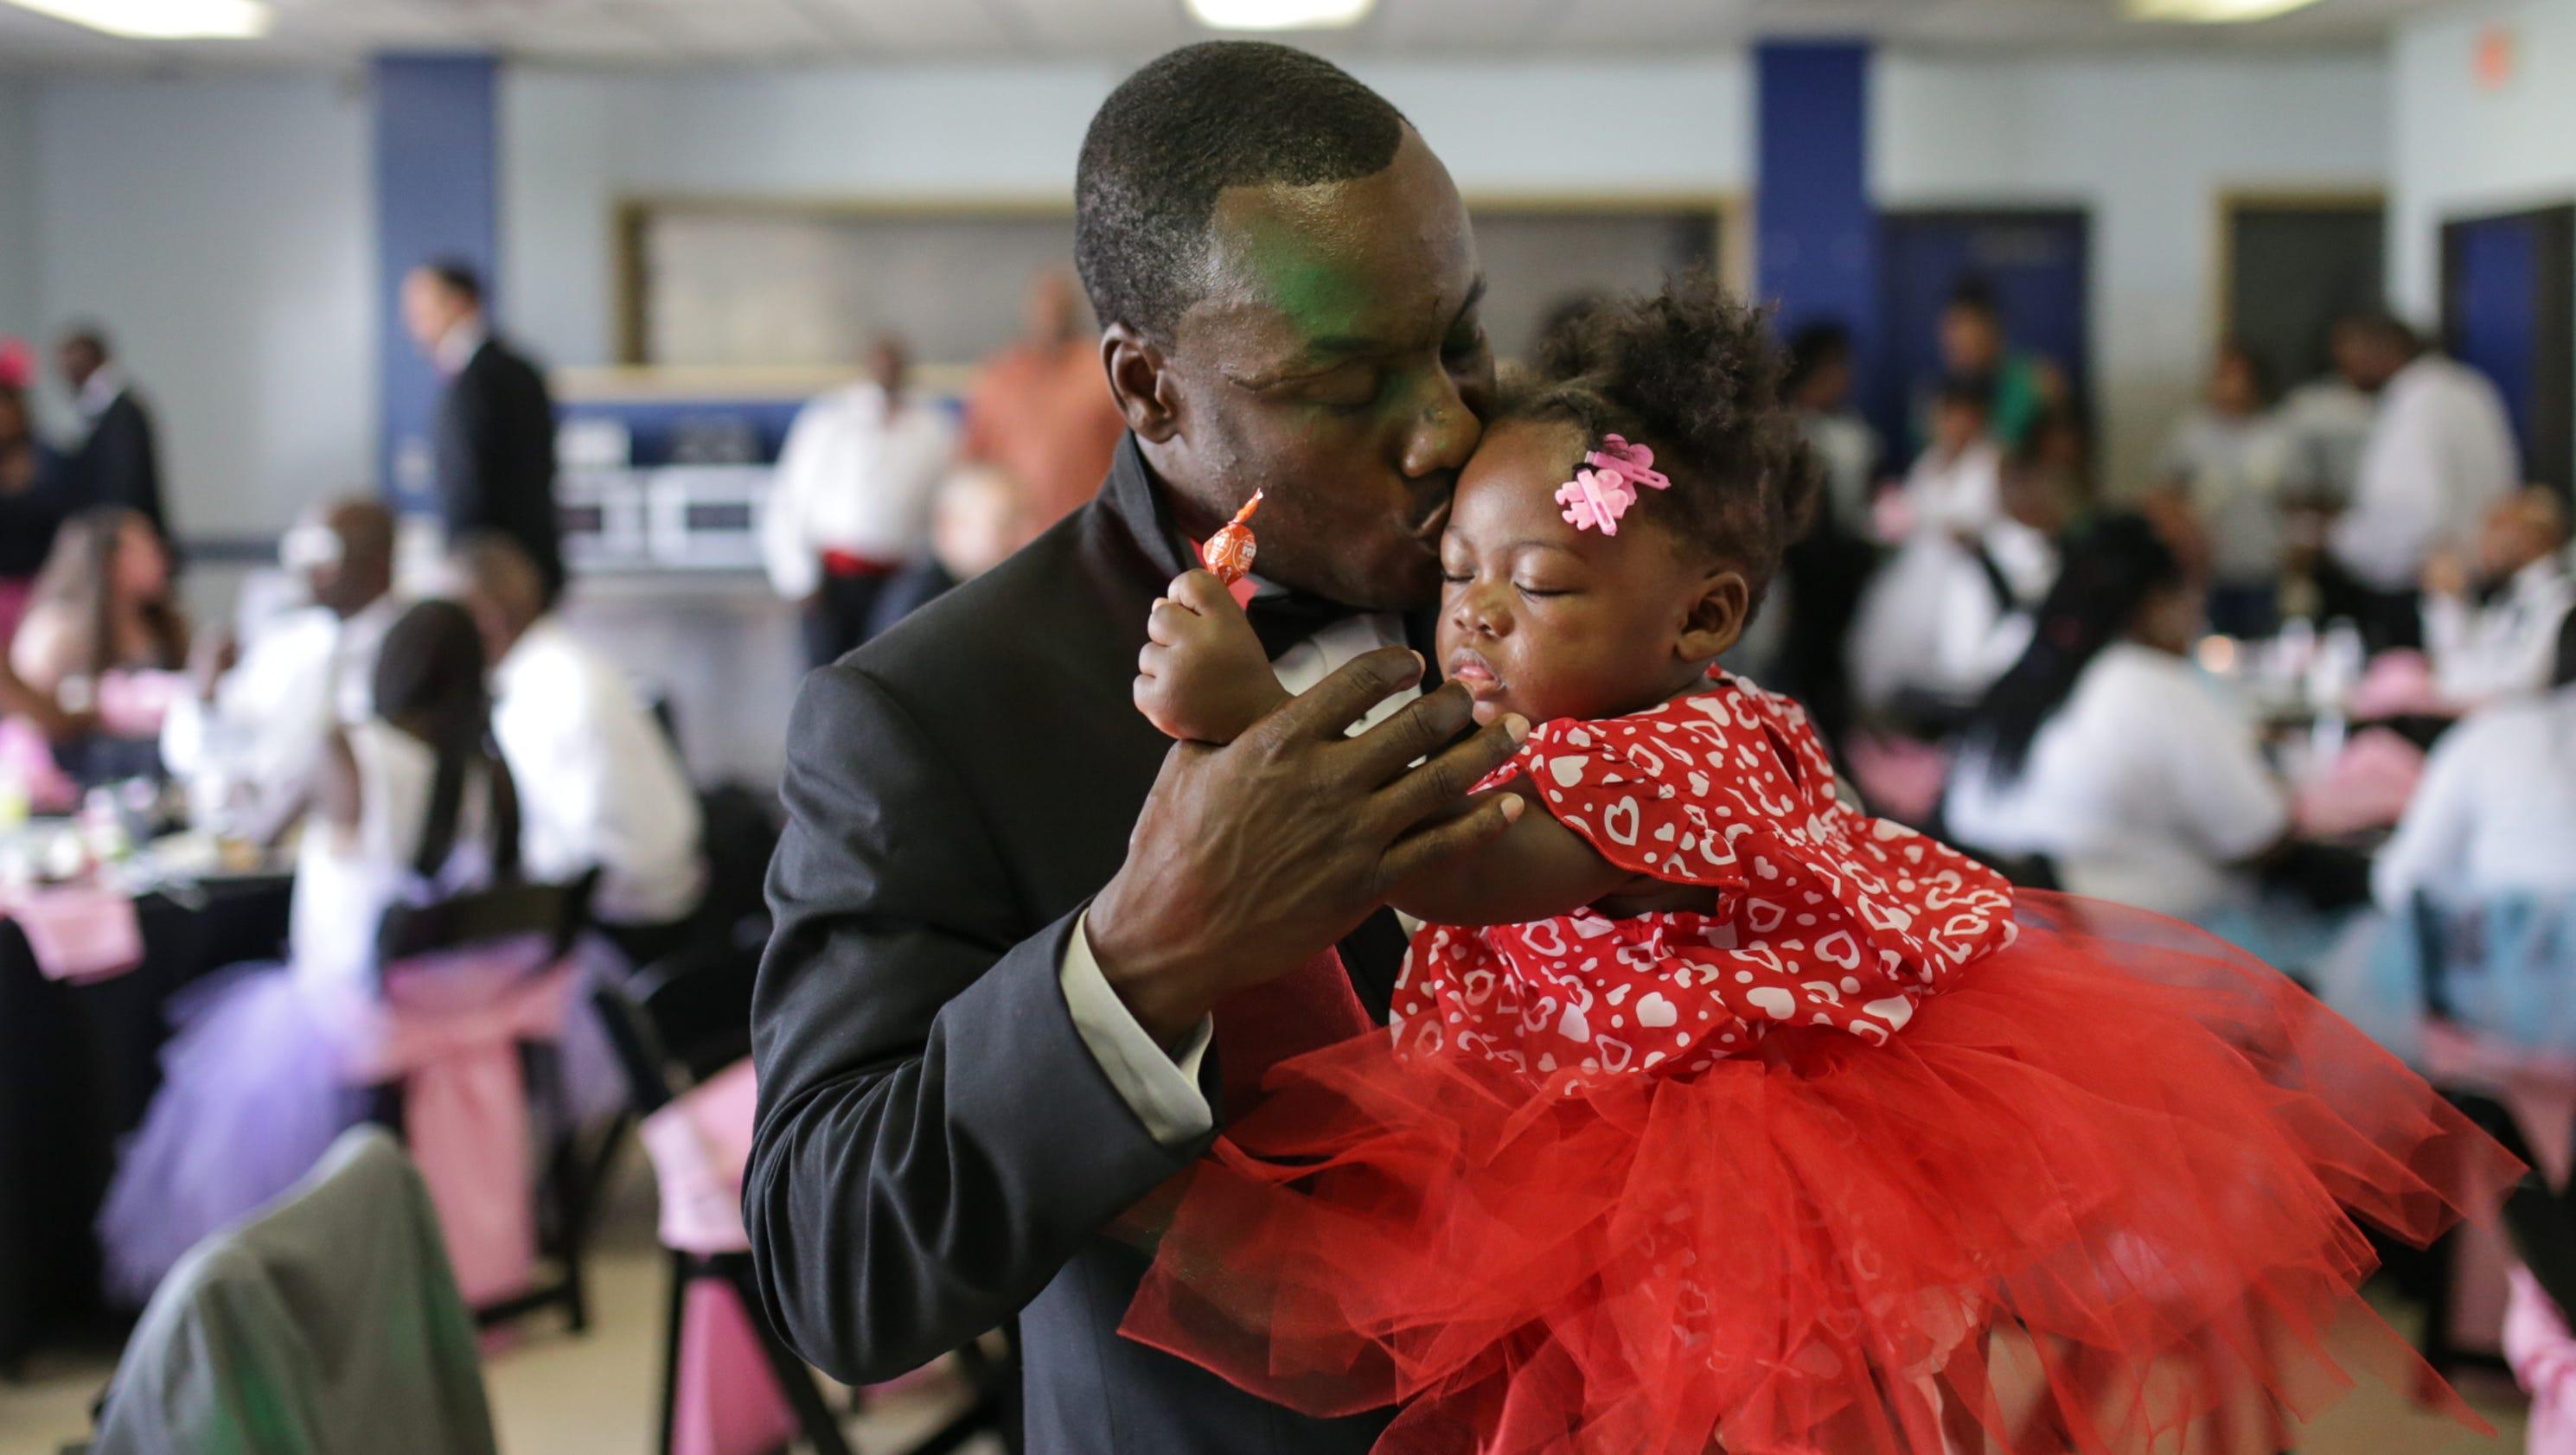 Daddy Daughter dance at Mariners Inn